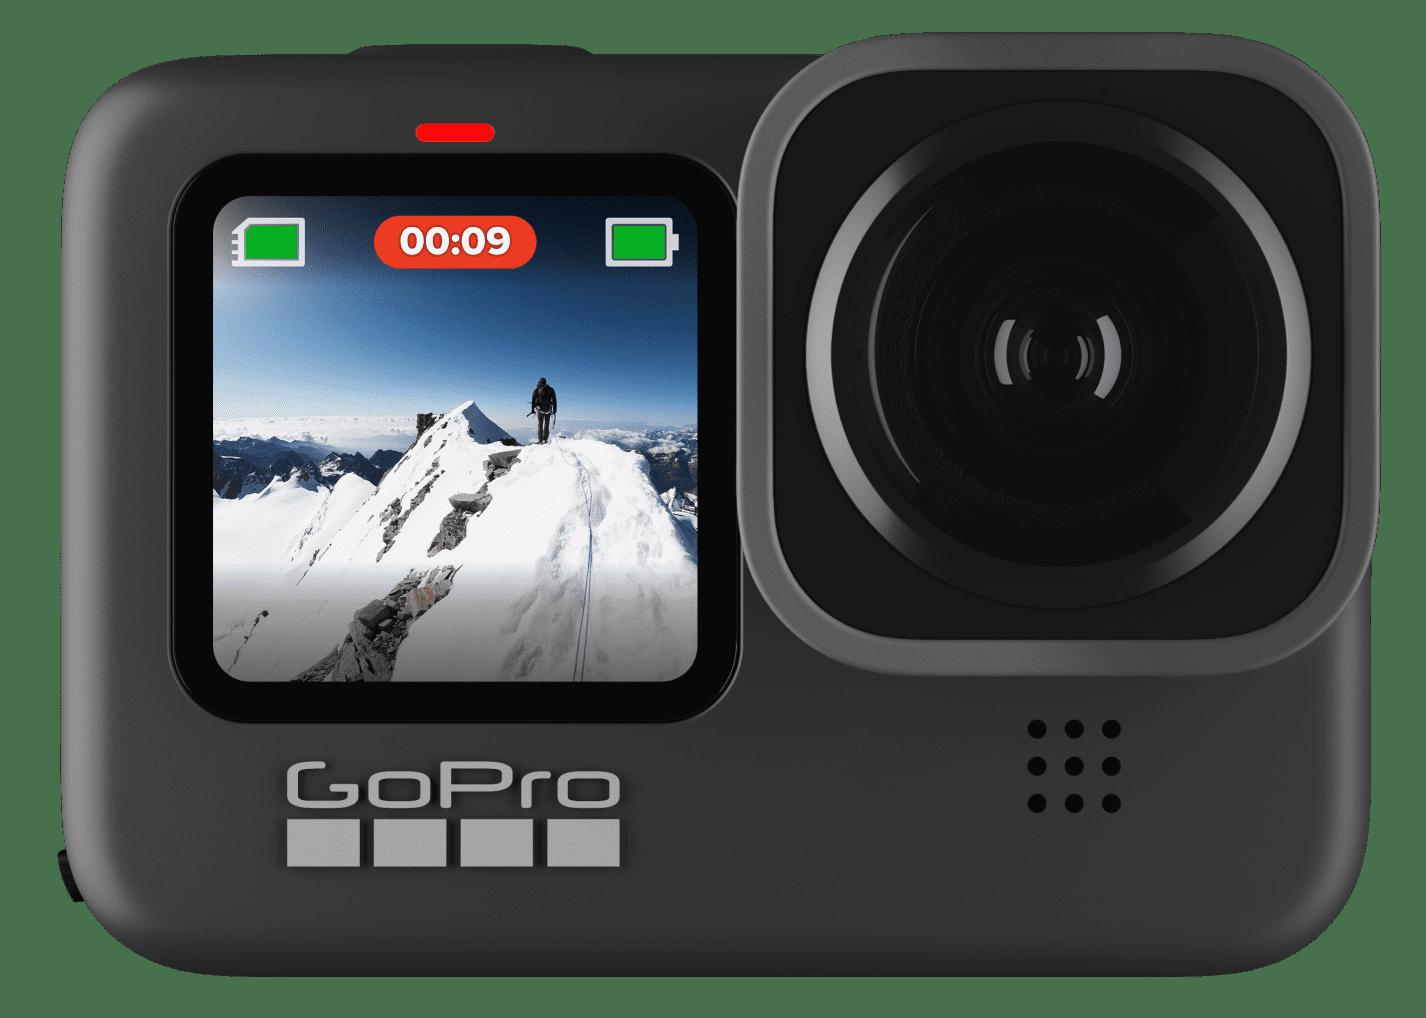 hero9-black-max-lens-mod-front-image